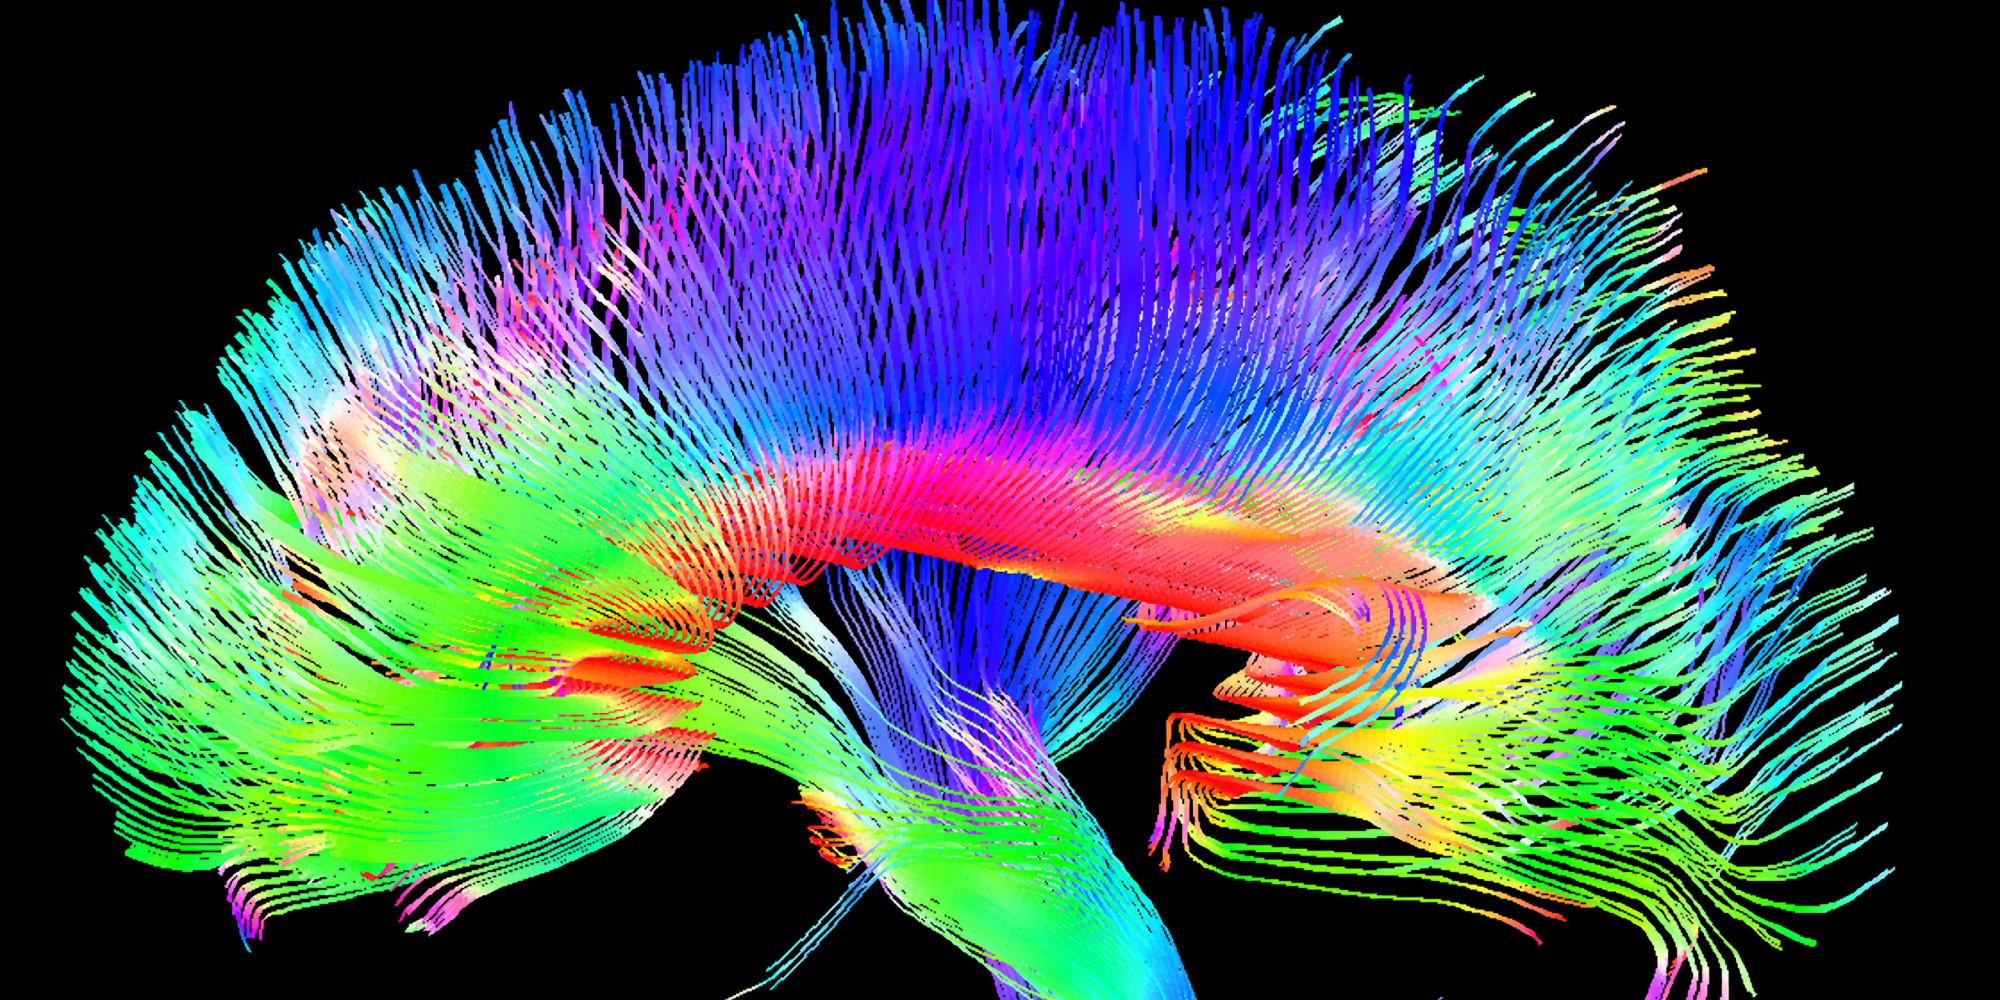 Brain Processes Music Much Like Spoken Language New Study Shows